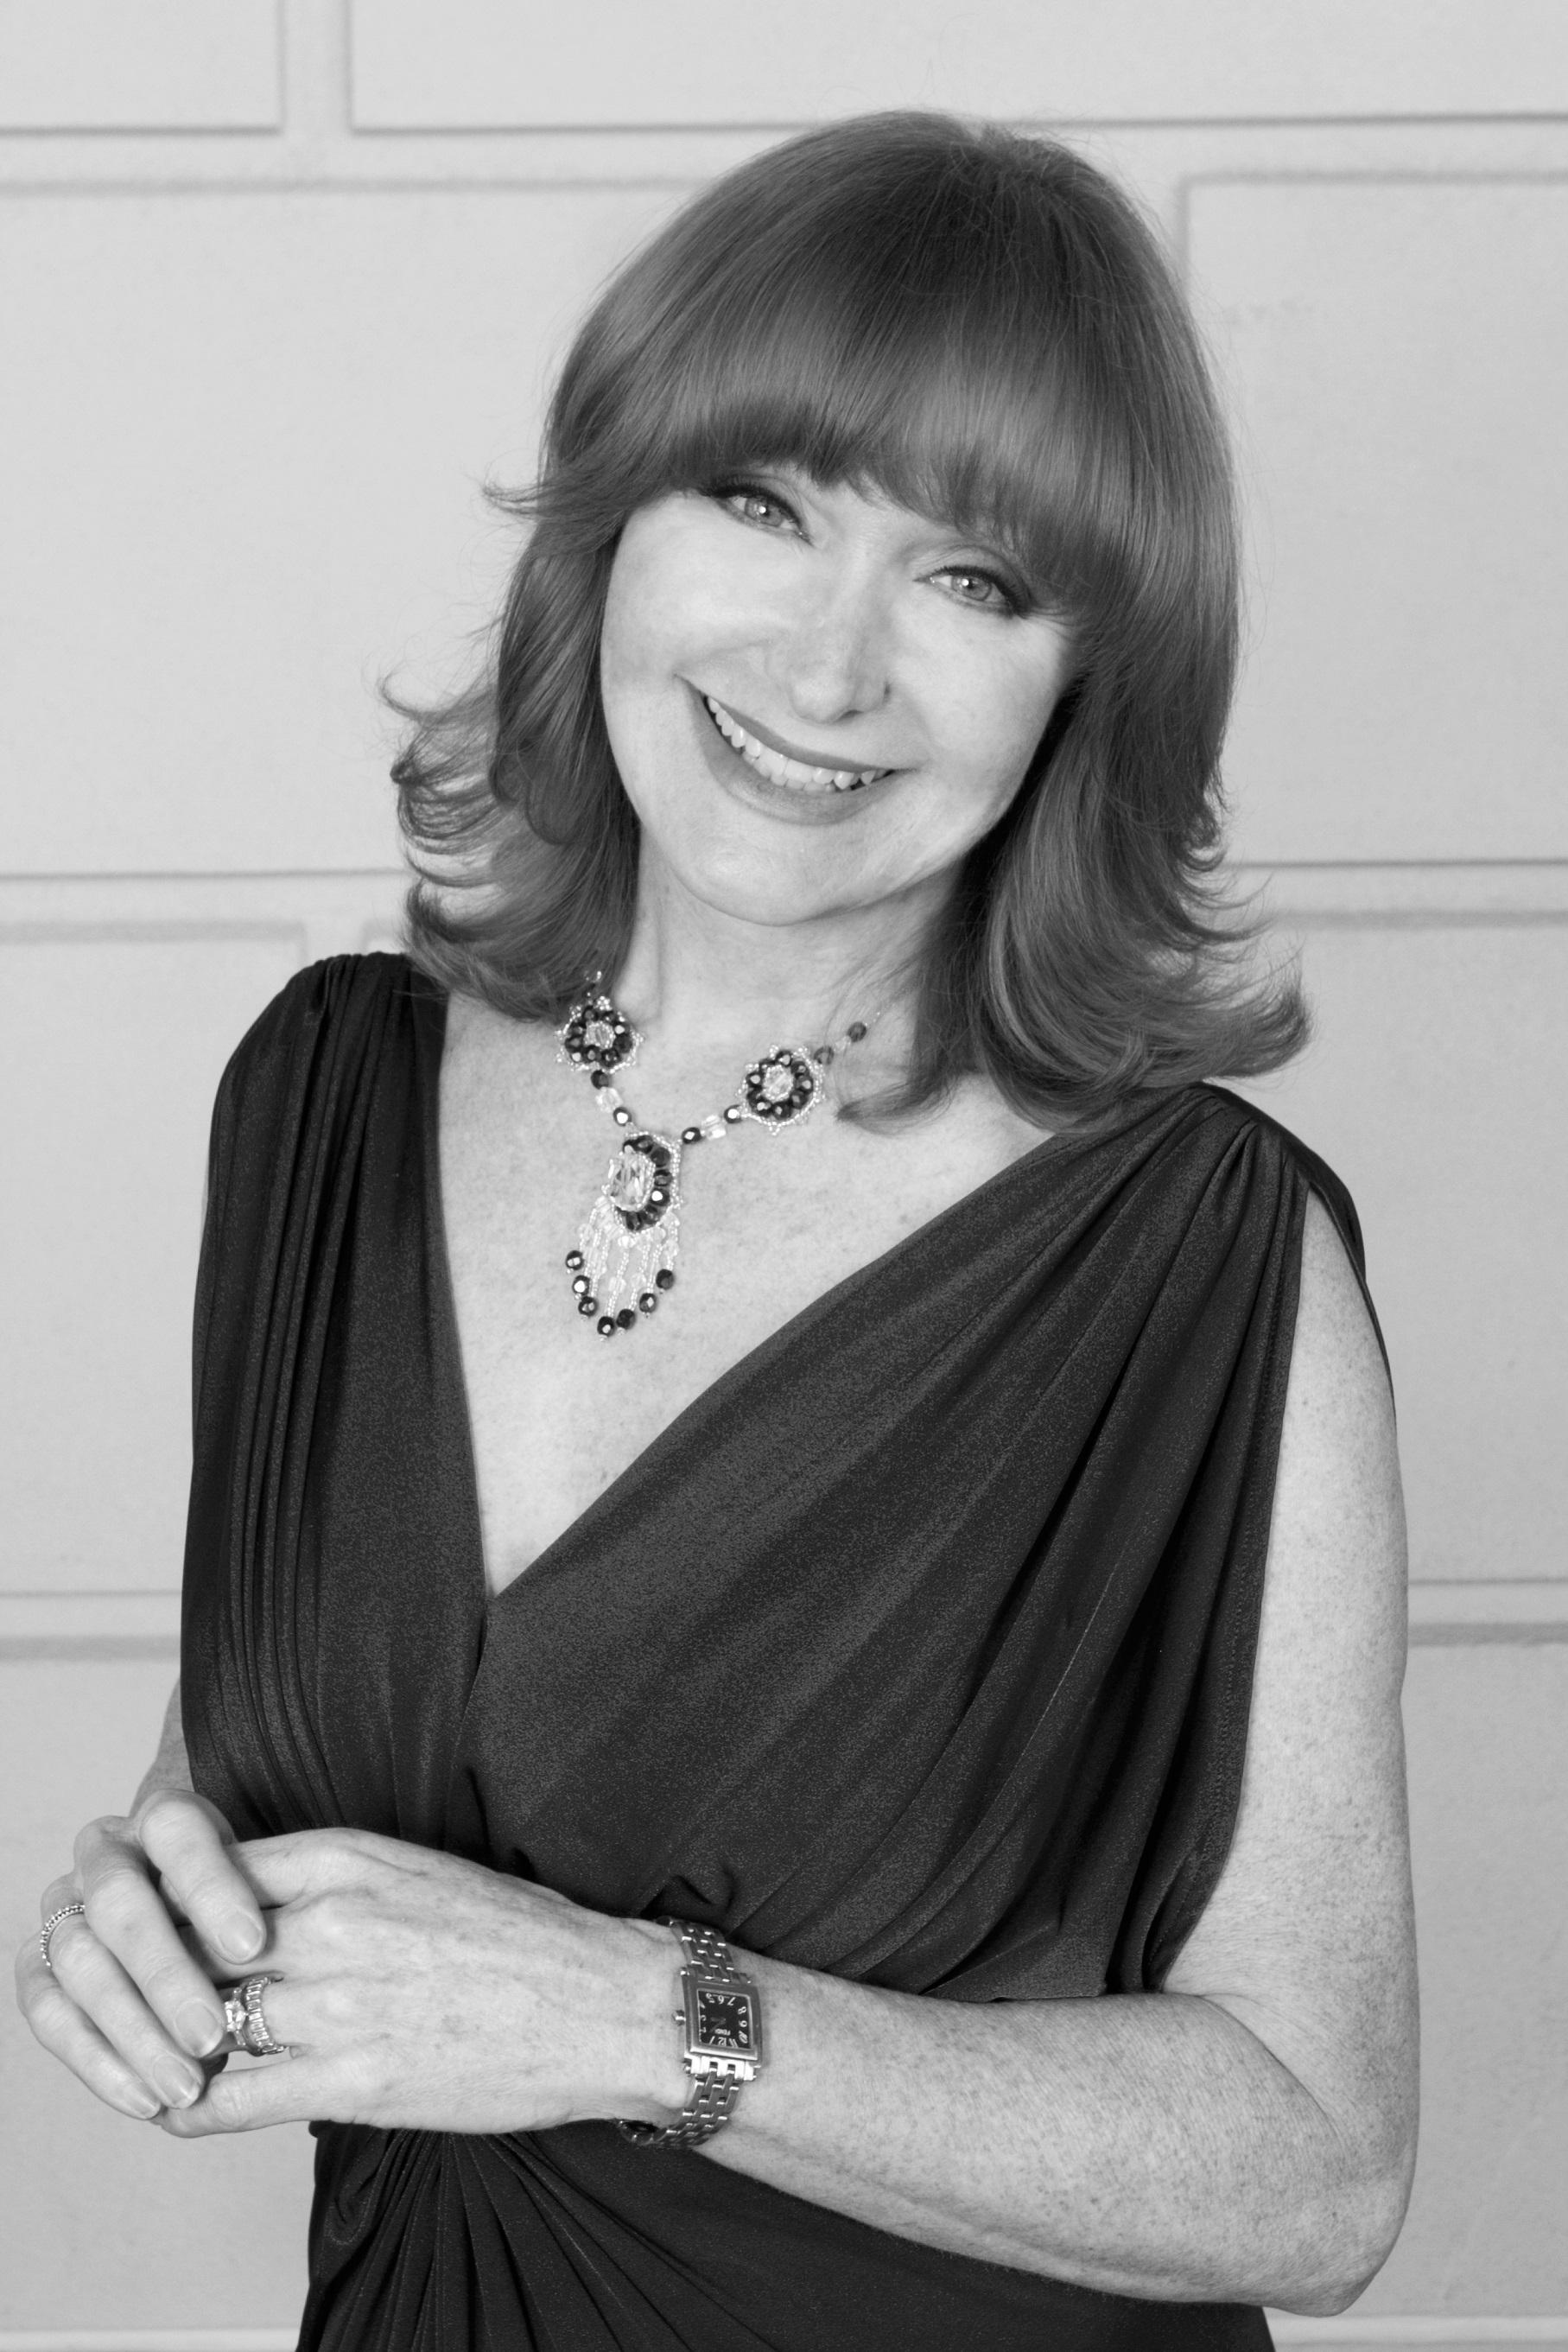 Vivienne Mackinder